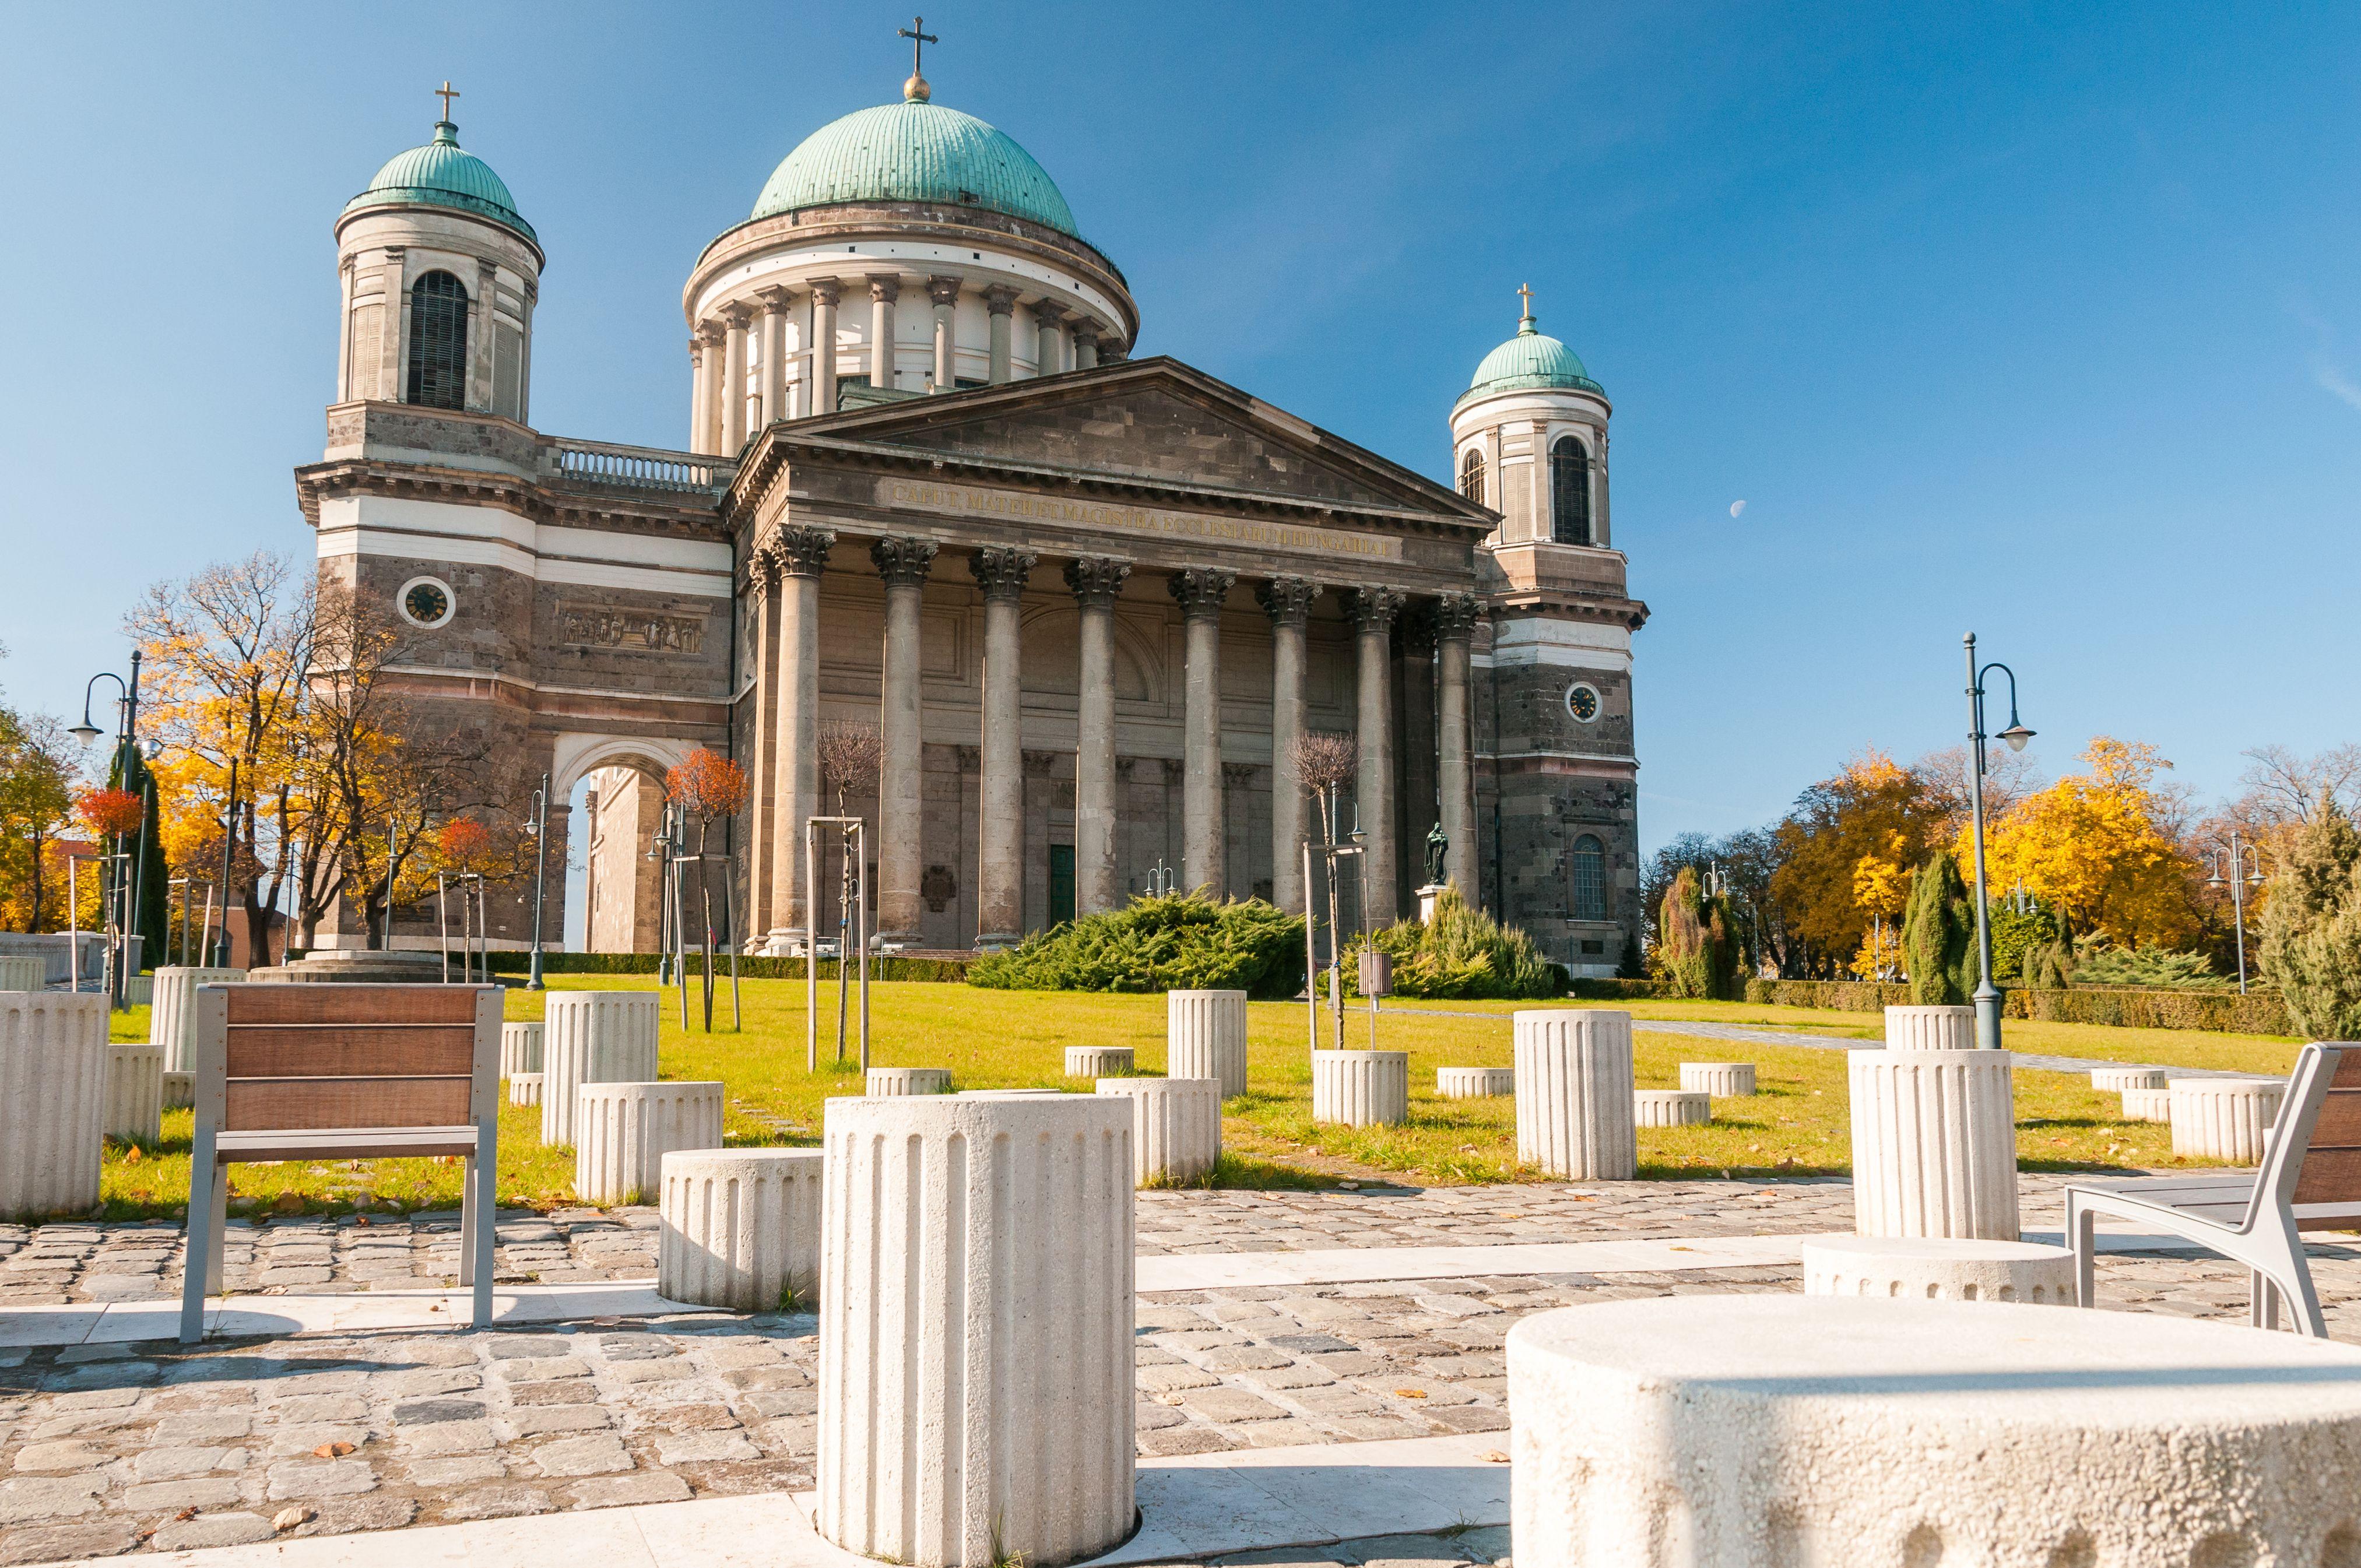 esztergom basilica in #budapest | budapest things to do